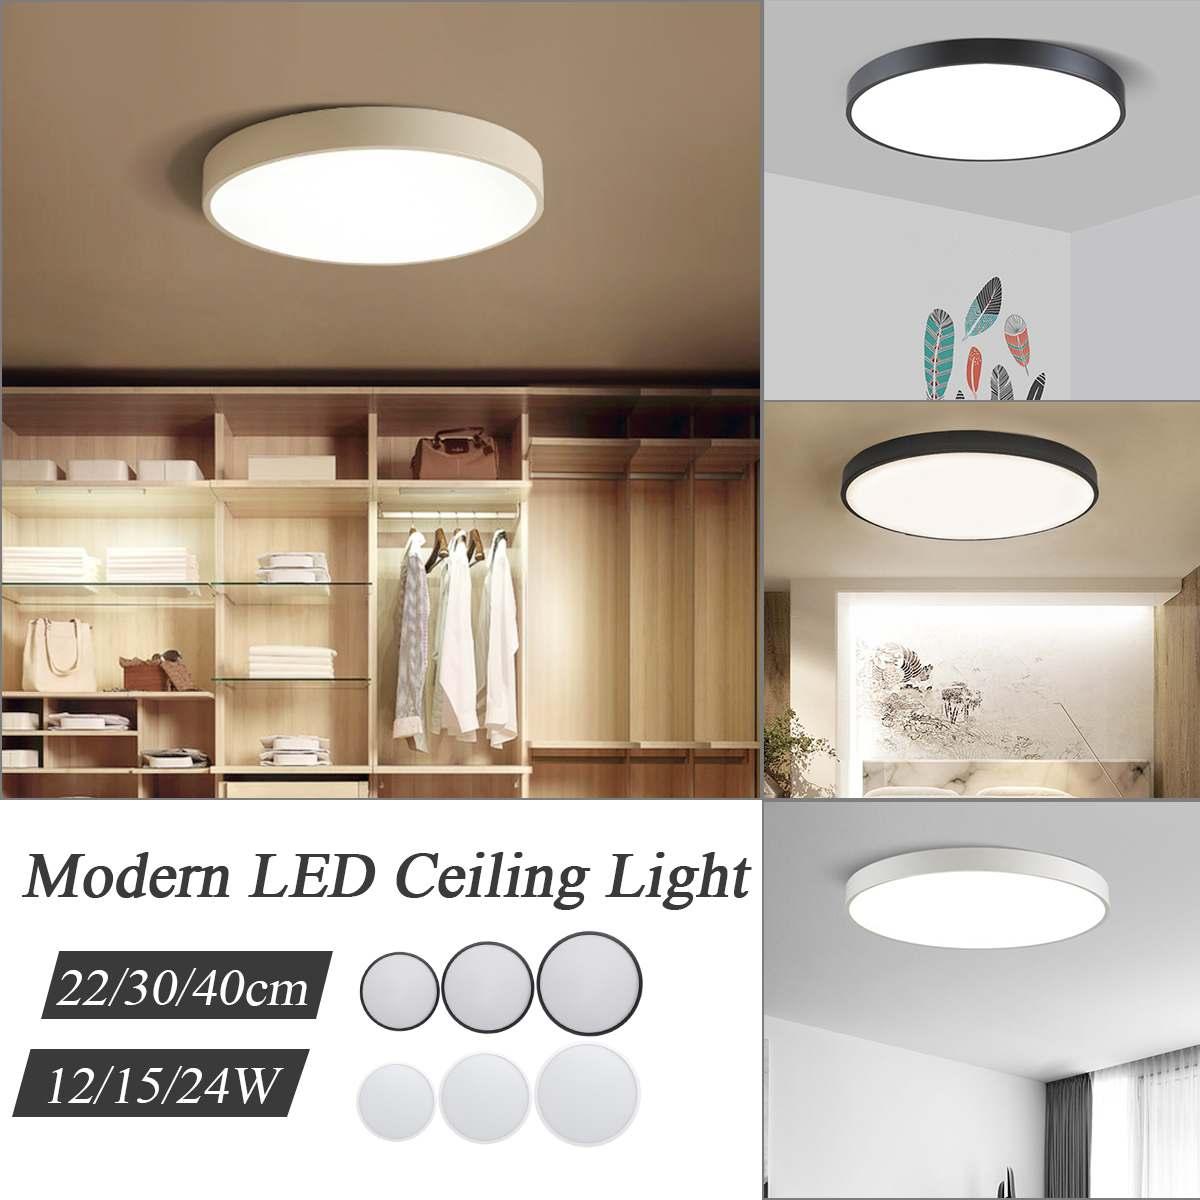 Home Furniture Diy 24w Living Room Led Ceiling Down Light Mount Lamp Kitchen Bedroom Ceiling Lights Hotelsetteemezzo It